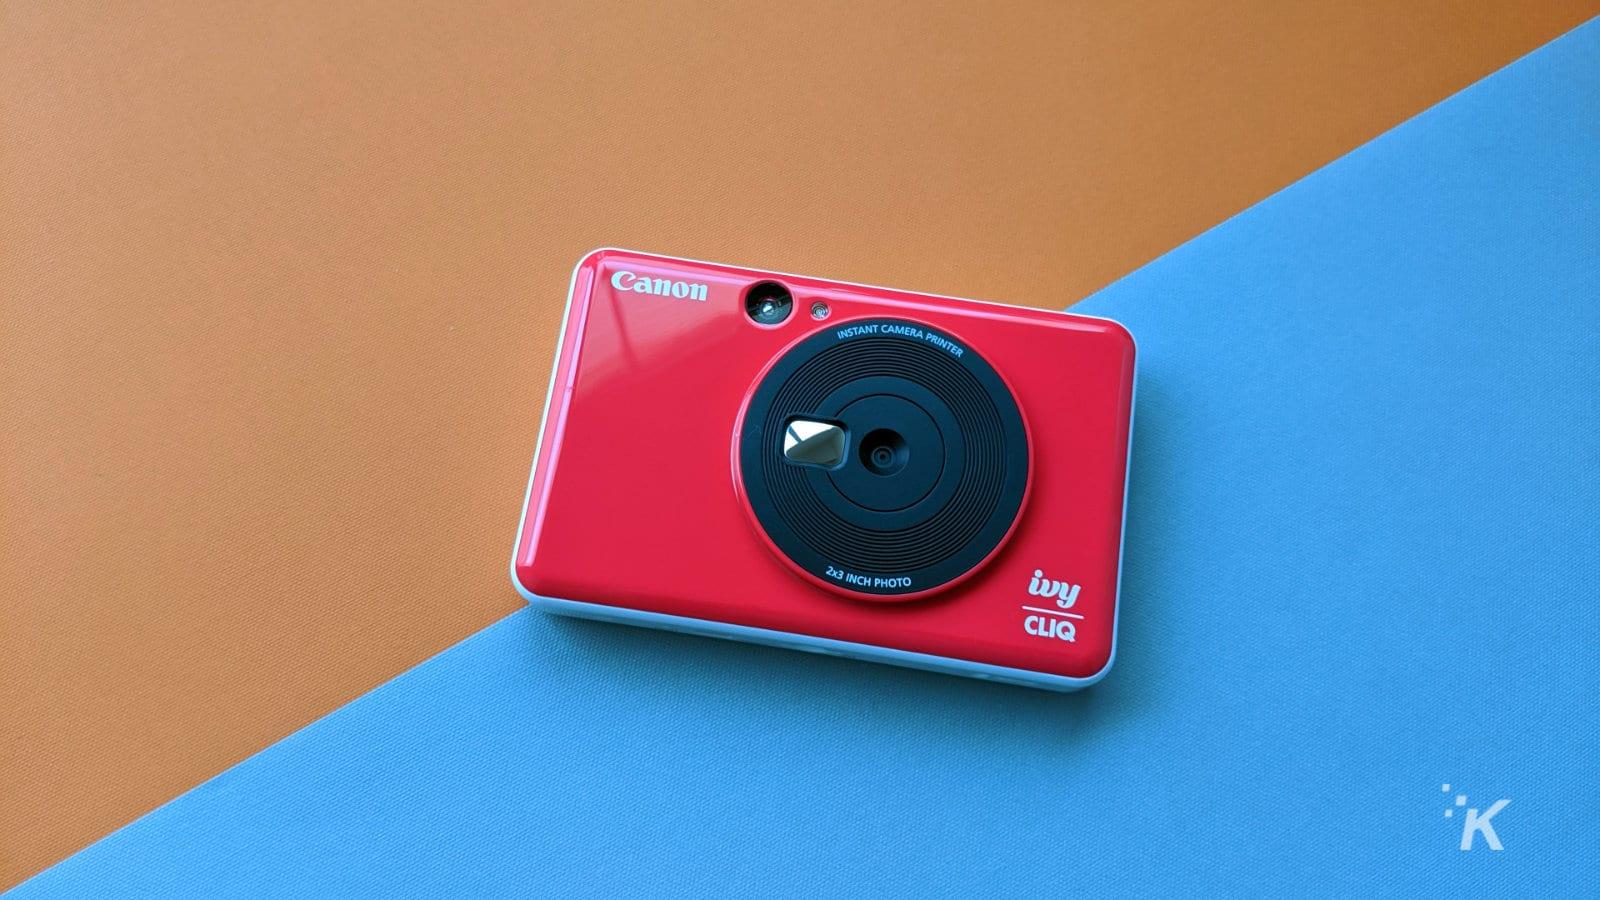 ivy cliq instant photo printing camera